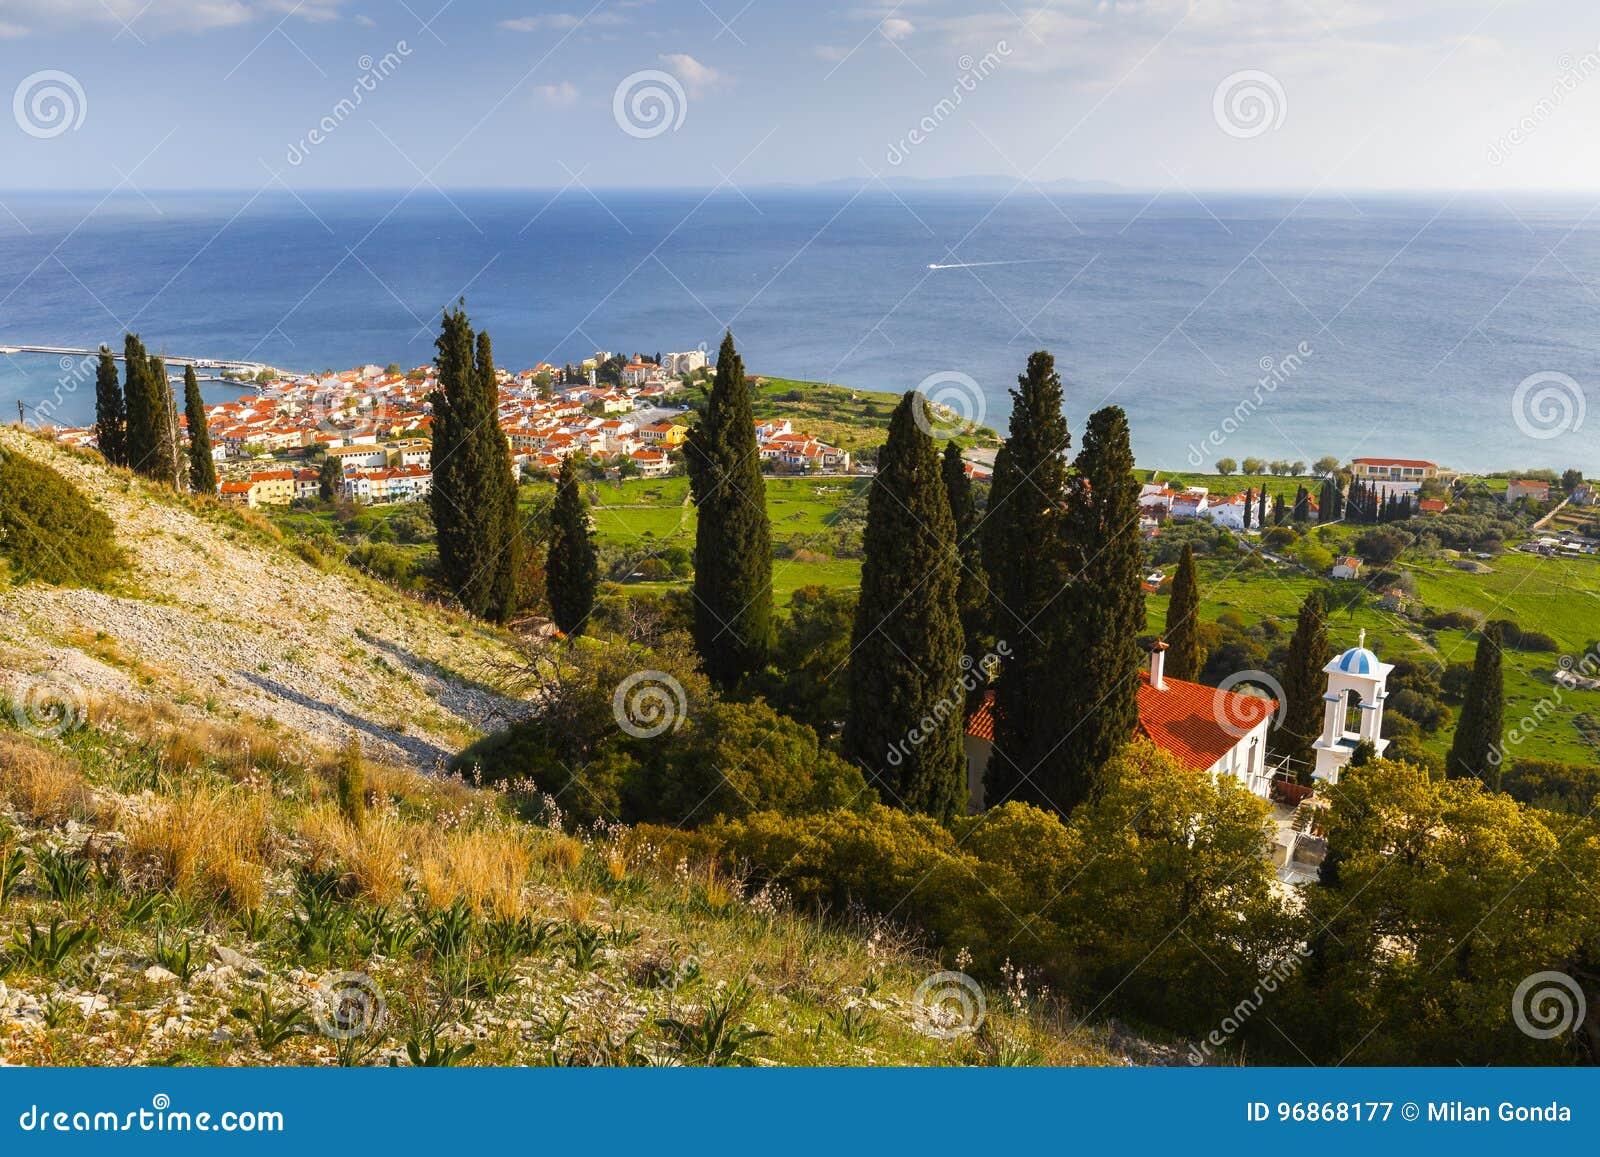 Samos island.